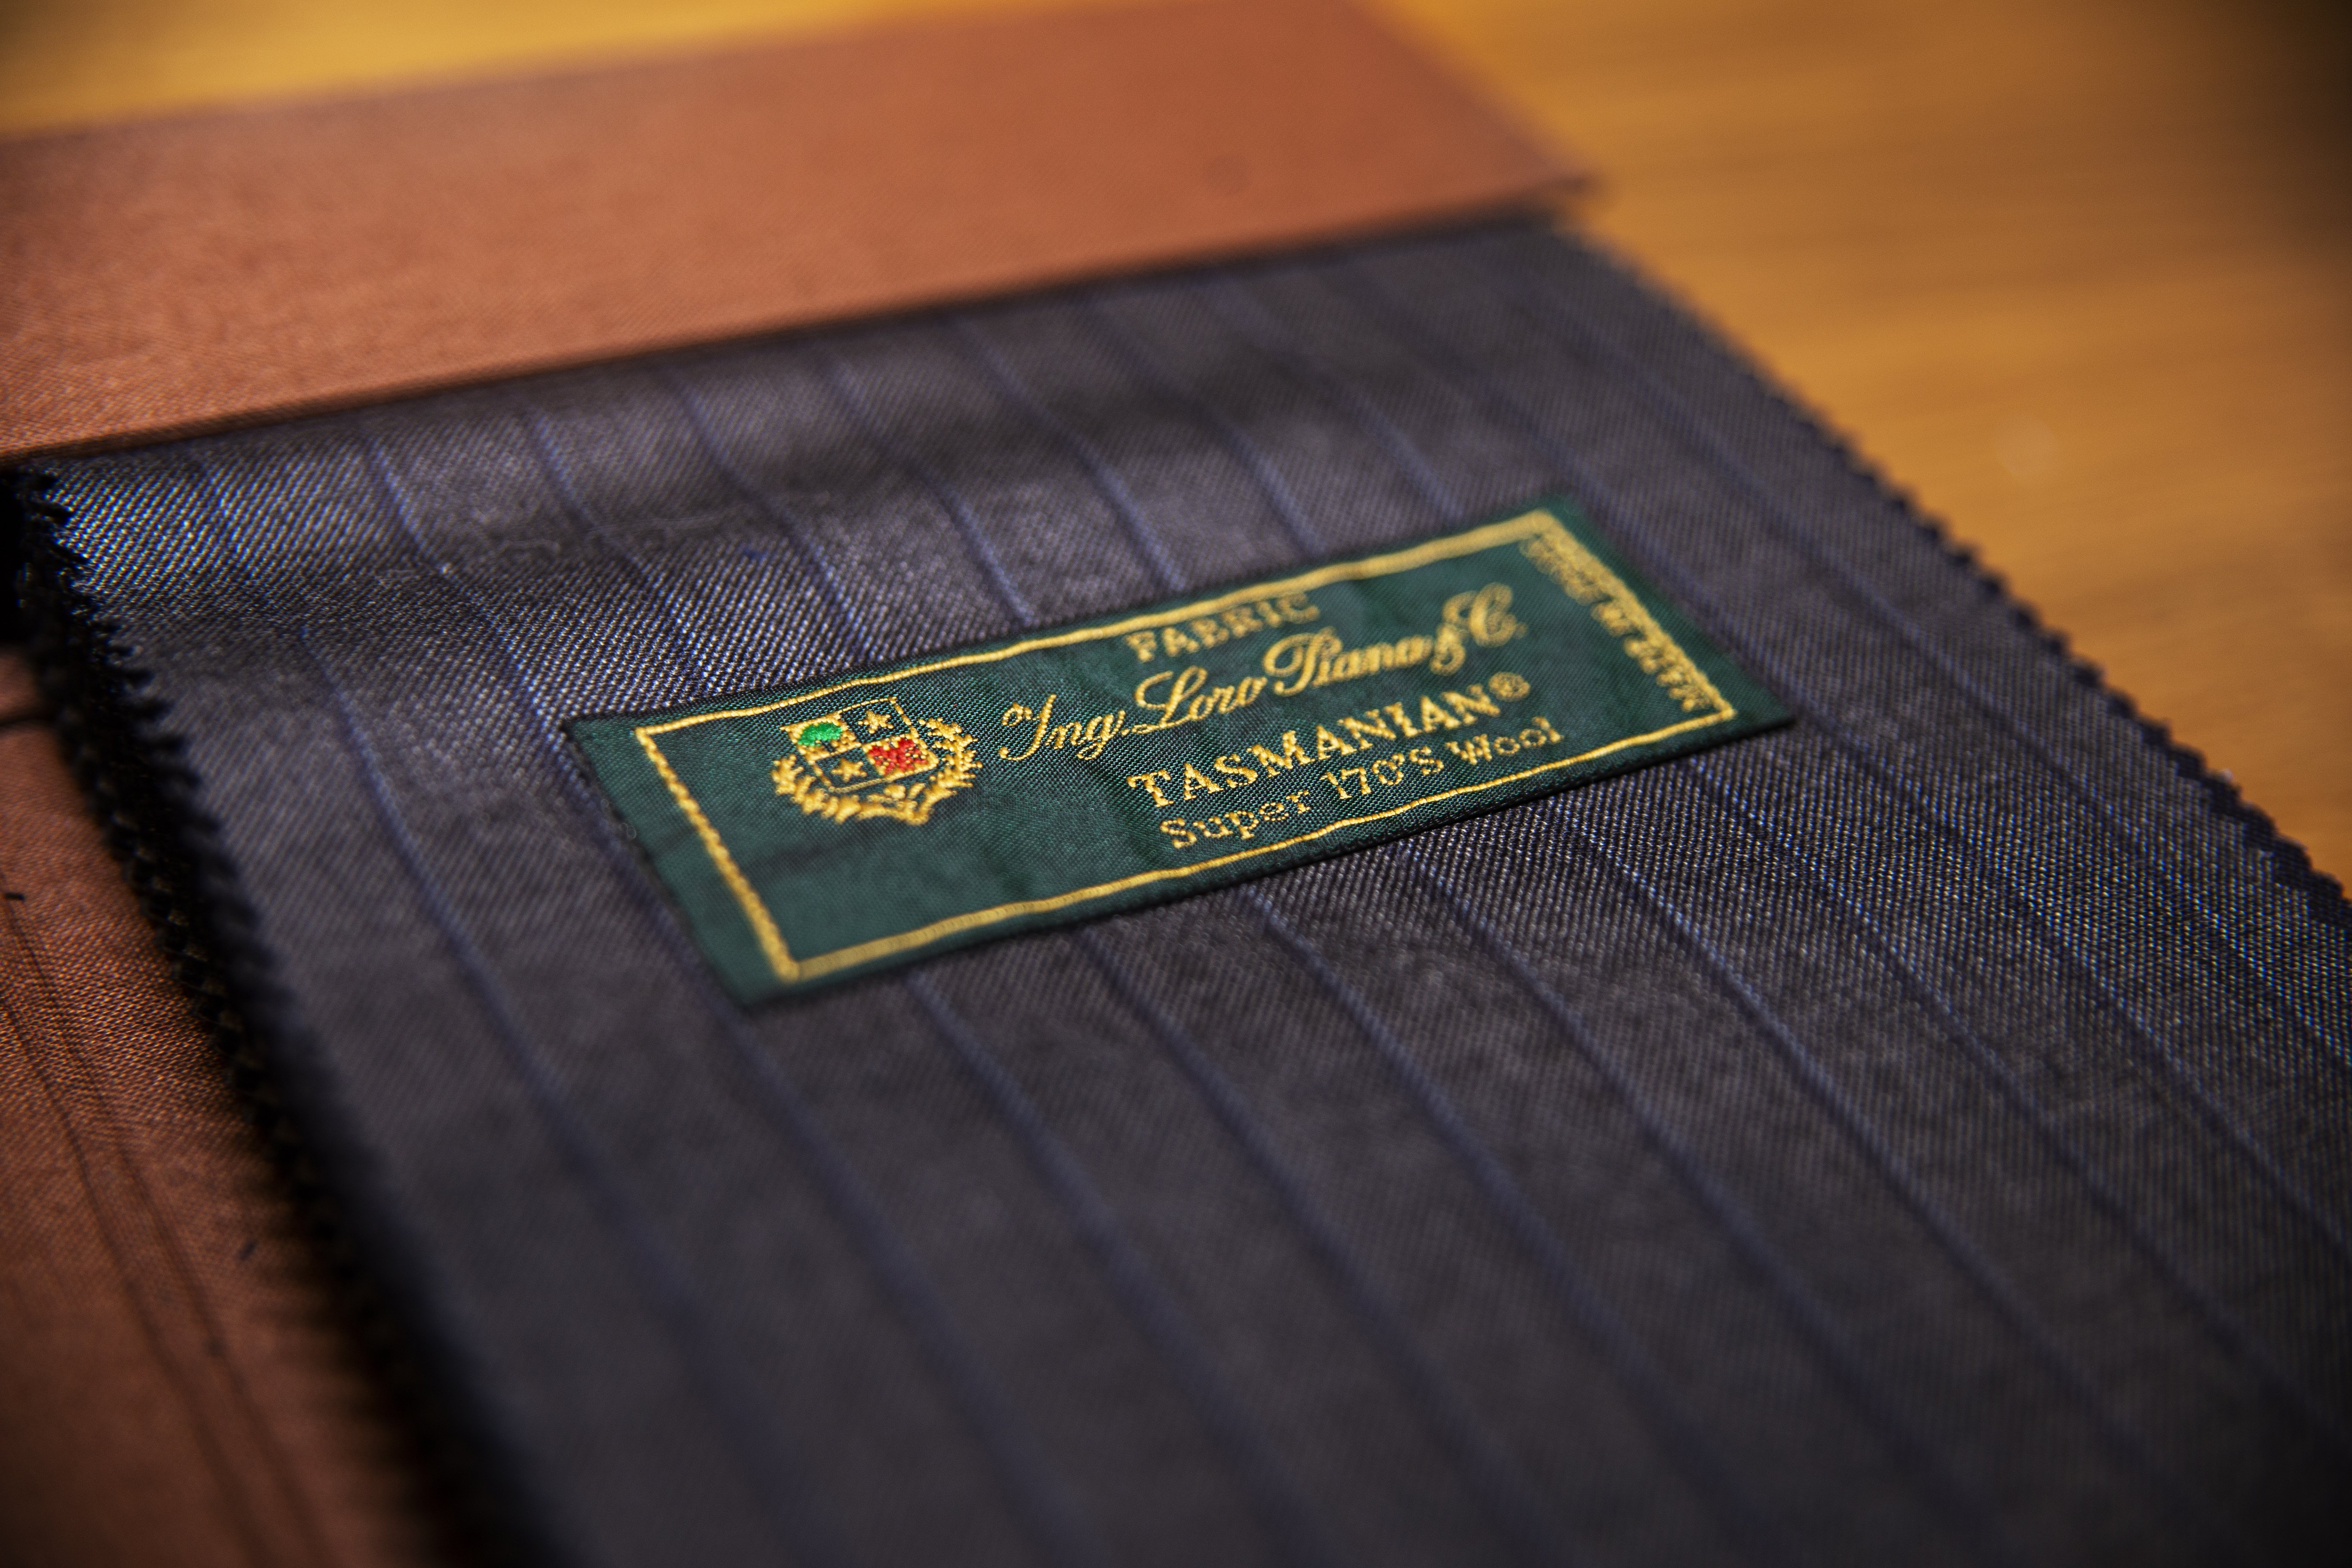 Nowy katalog z tkaninami od Loro Piana.